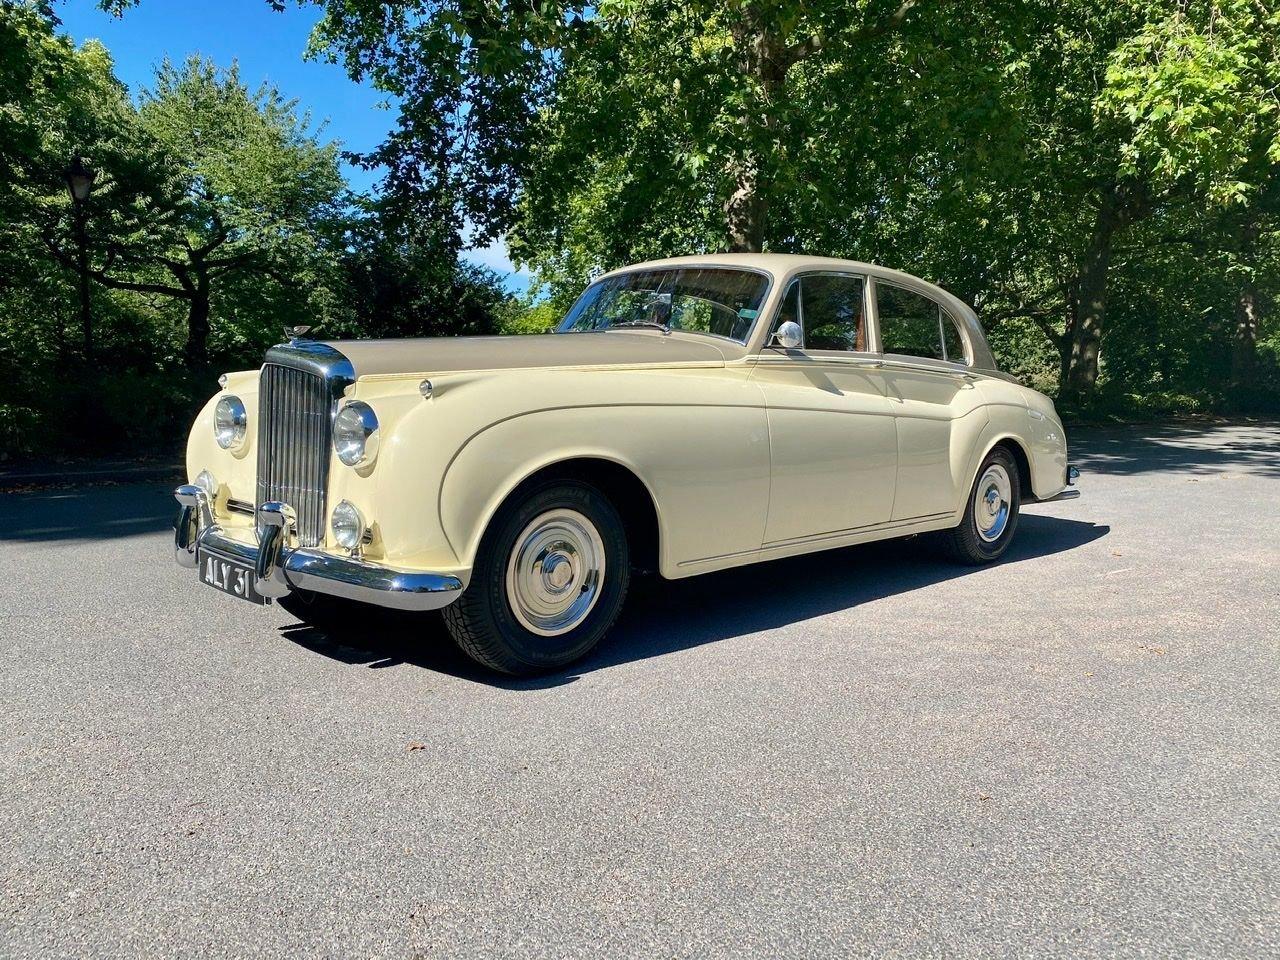 1958 Bentley S1 4 door saloon by James Young For Sale (picture 1 of 24)